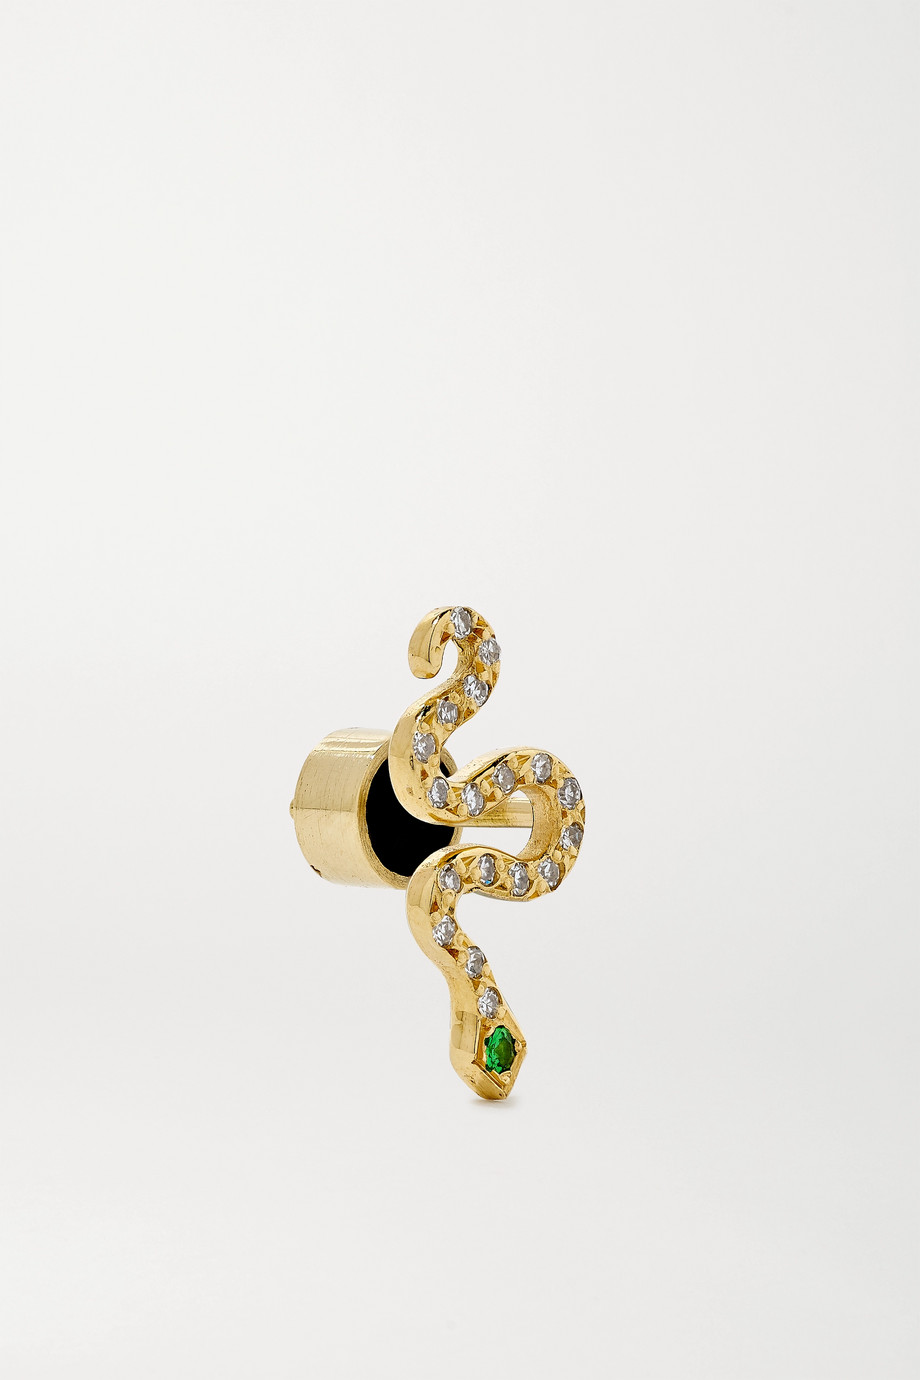 Ileana Makri Little Snake Ohrringe aus 18 Karat Gold mit Diamanten und Tsavoriten